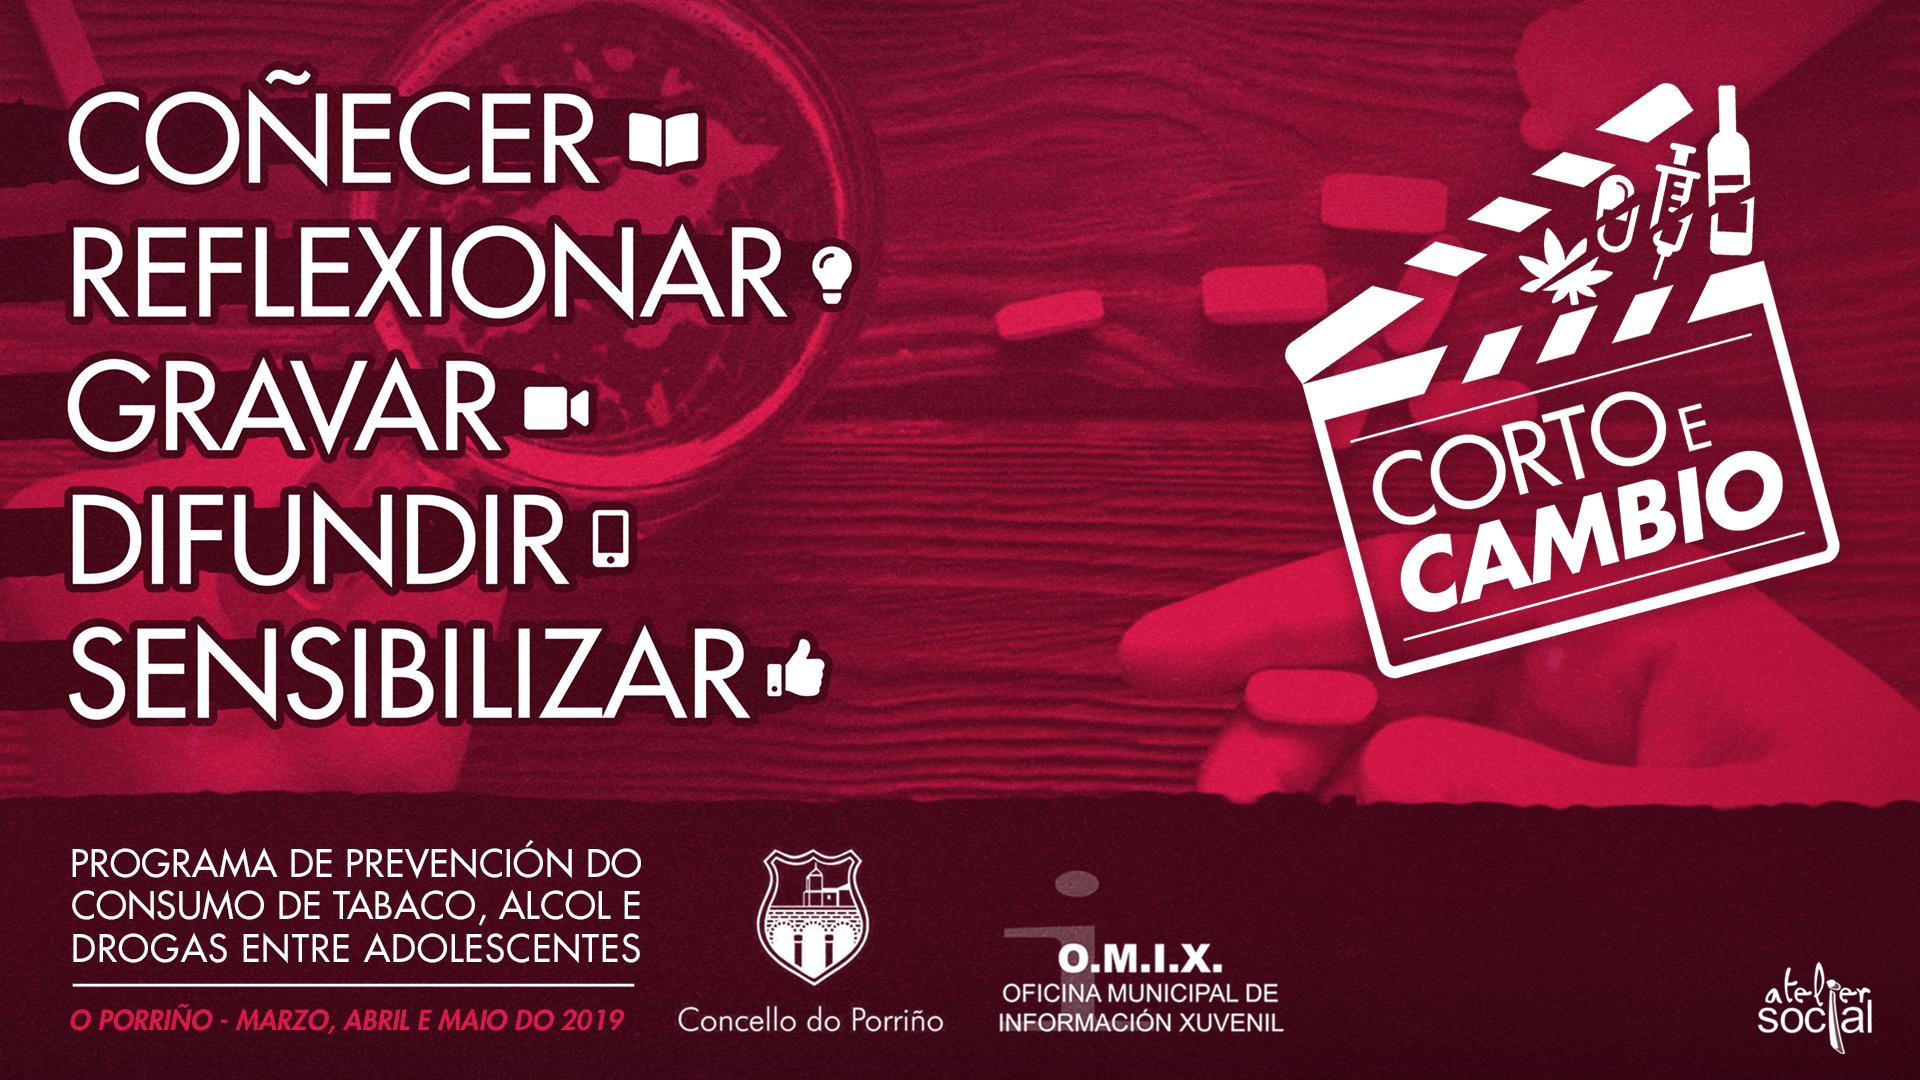 """CORTO E CAMBIO"": presentamos as dez pezas audiovisuais elaboradas por alumnos porriñeses para alertar contra o consumo de drogas, alcol e tabaco."